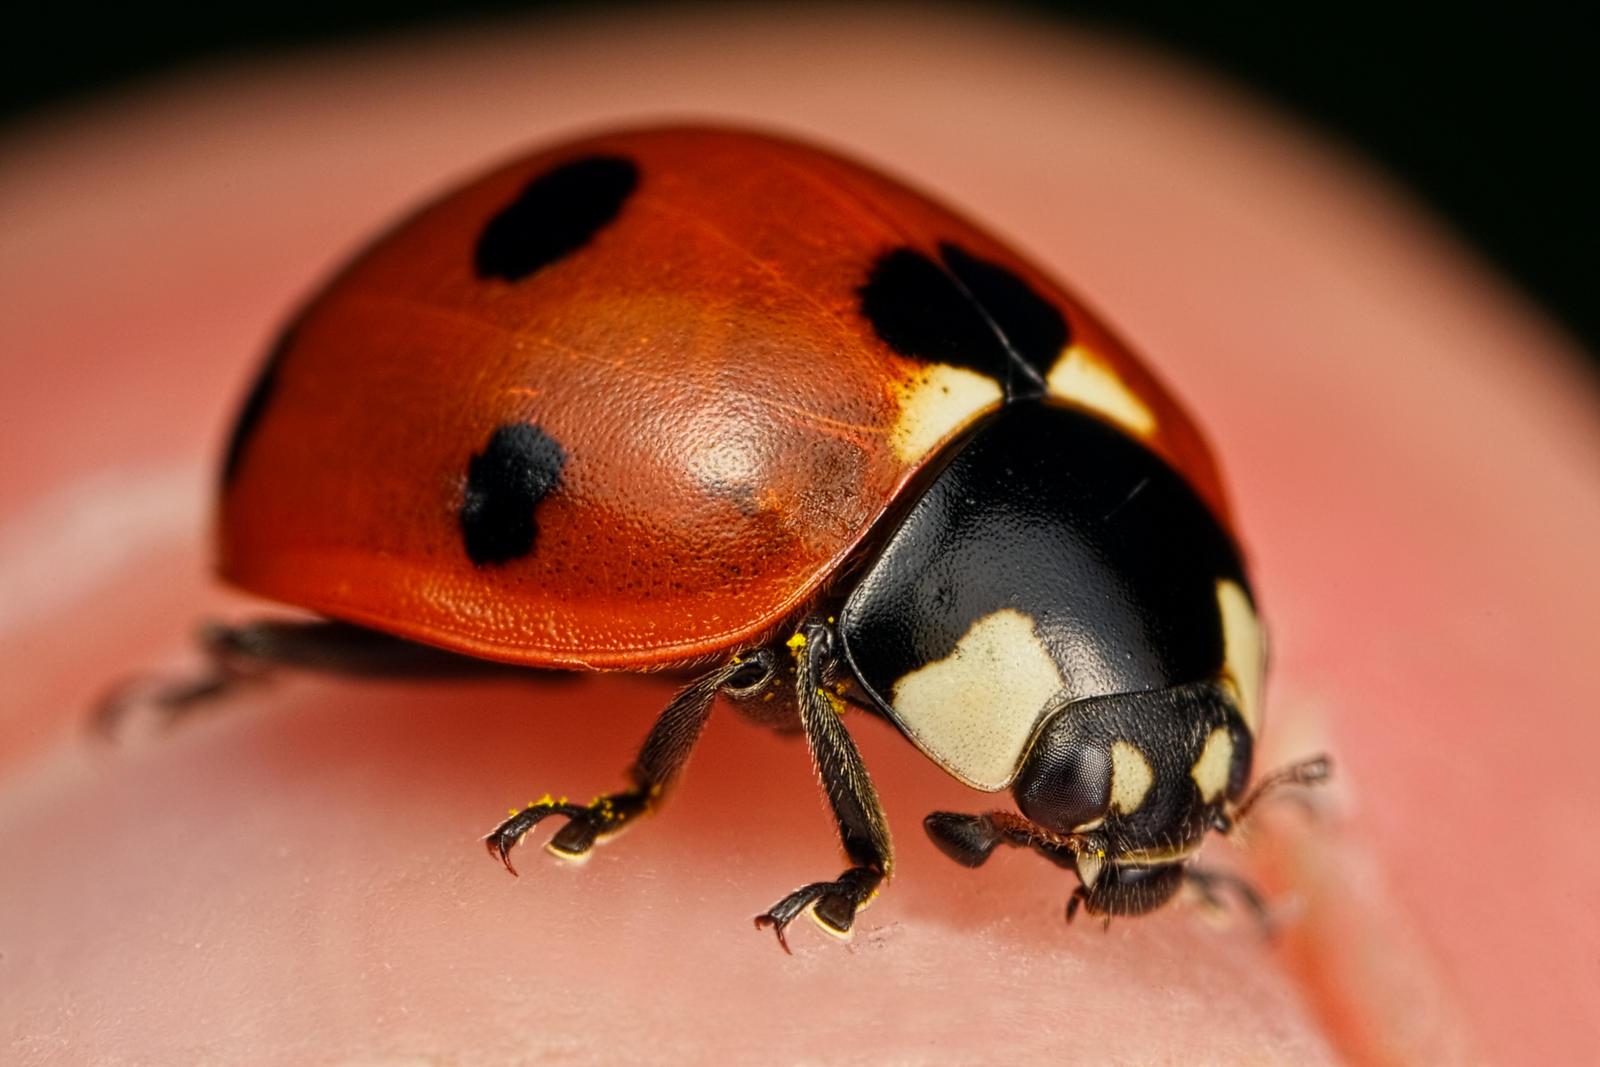 My Pet Ladybug